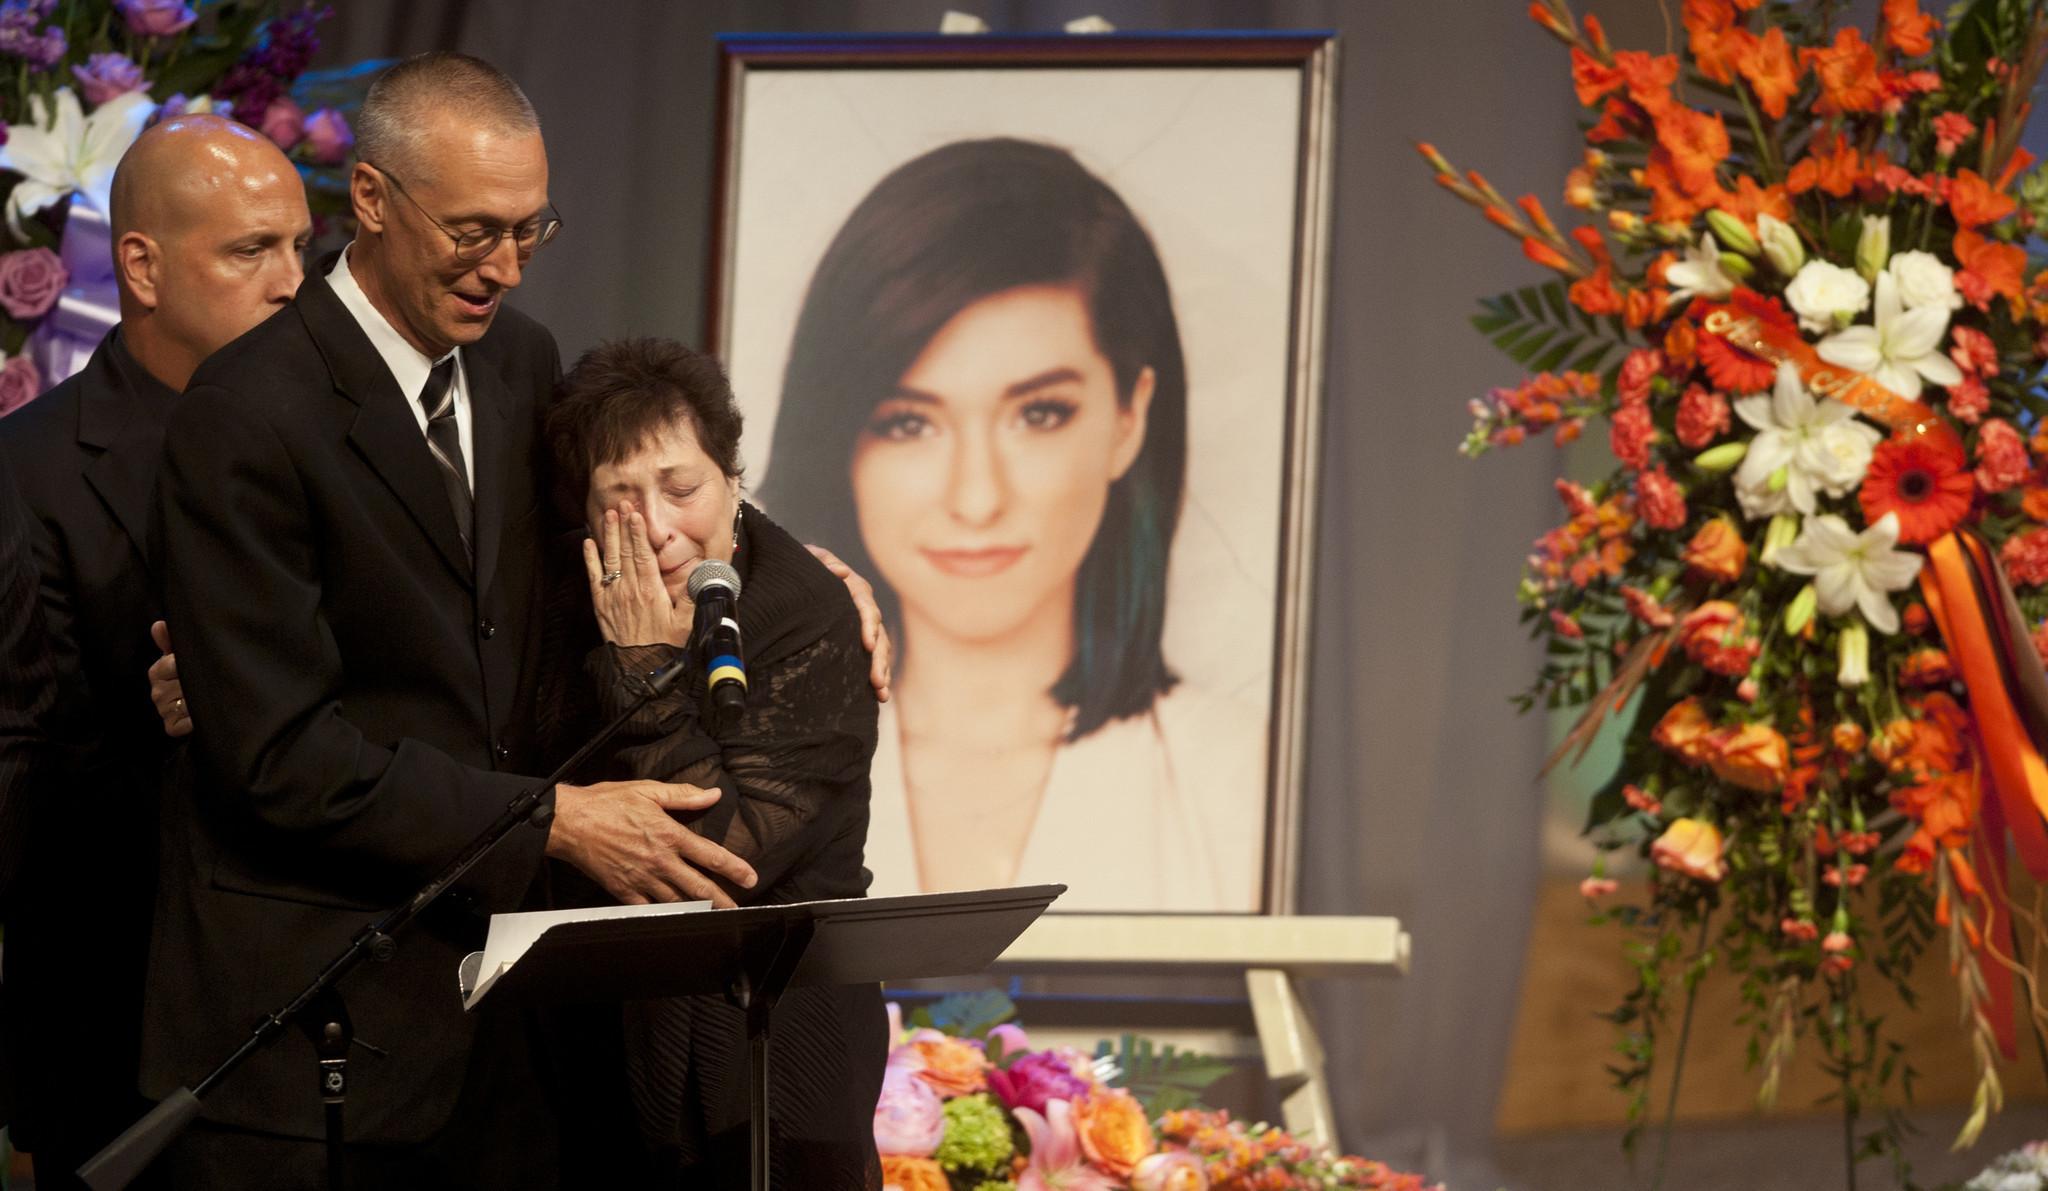 Thousands Say Farewell To Slain Voice Singer Christina